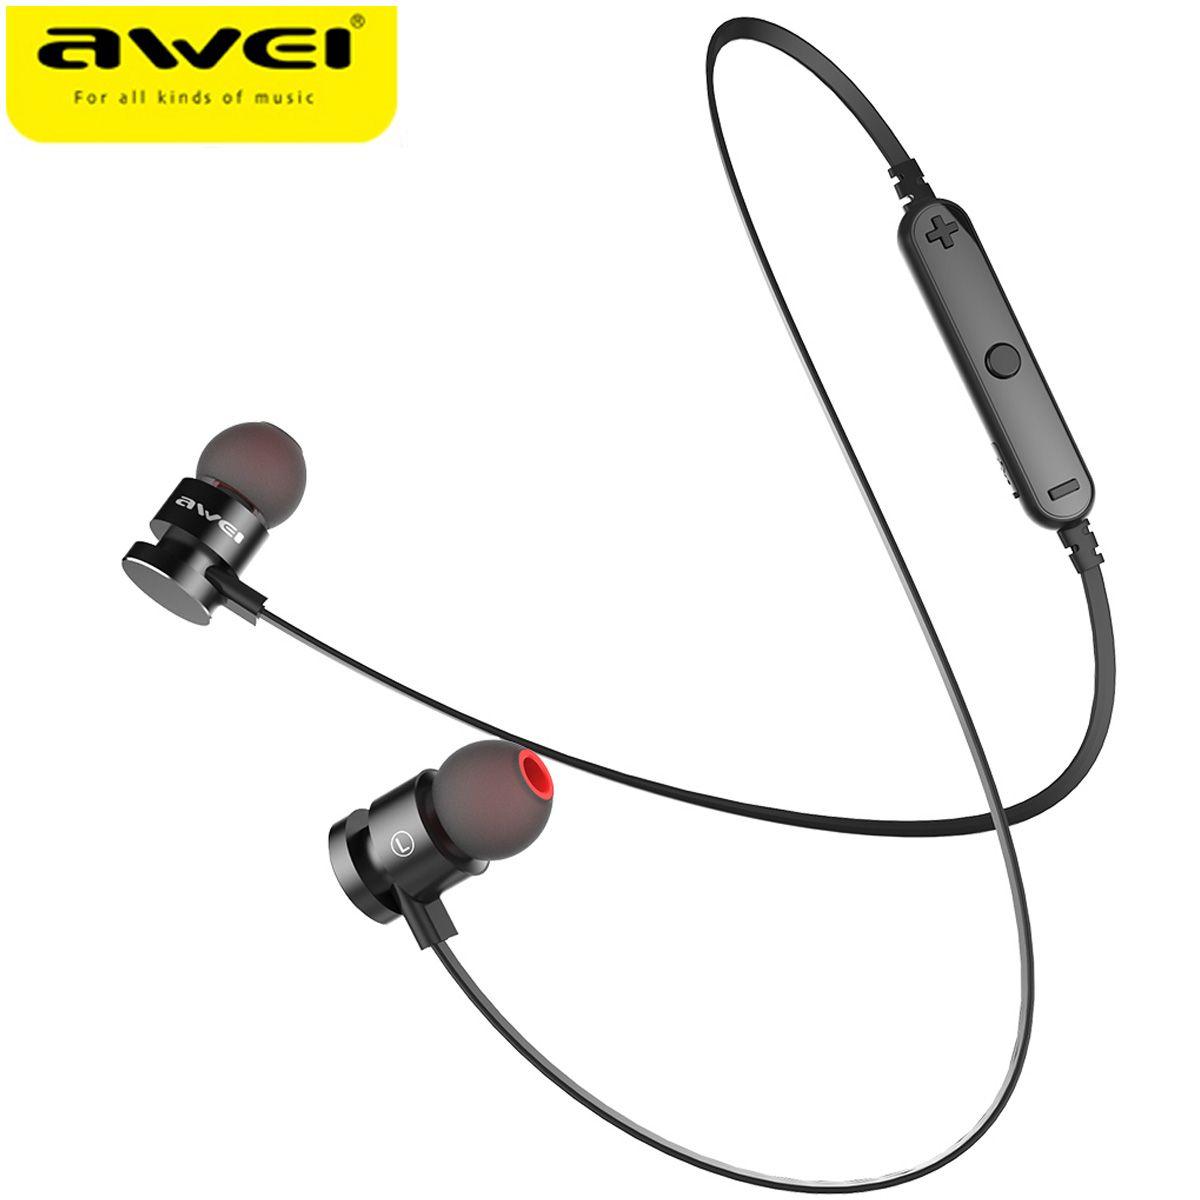 2017 Más Reciente T11 AWEI Auriculares Inalámbricos Bluetooth Banda Para El Cuello Auriculares Écouteur Fone de ouvido Auriculares Para Teléfono Bluetooth V4.2